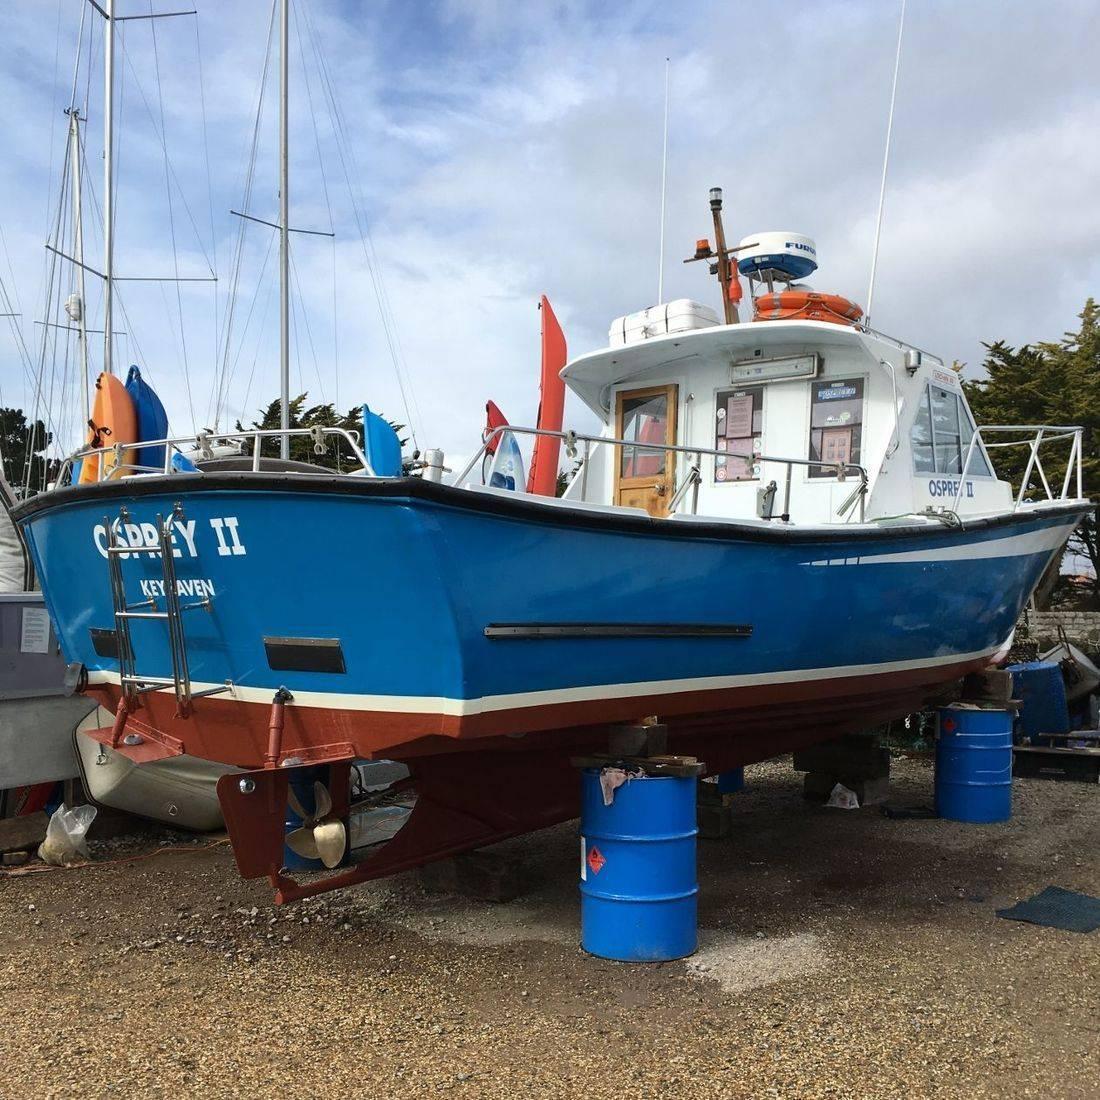 Fishing boat Osprey II ashore at Keyhaven